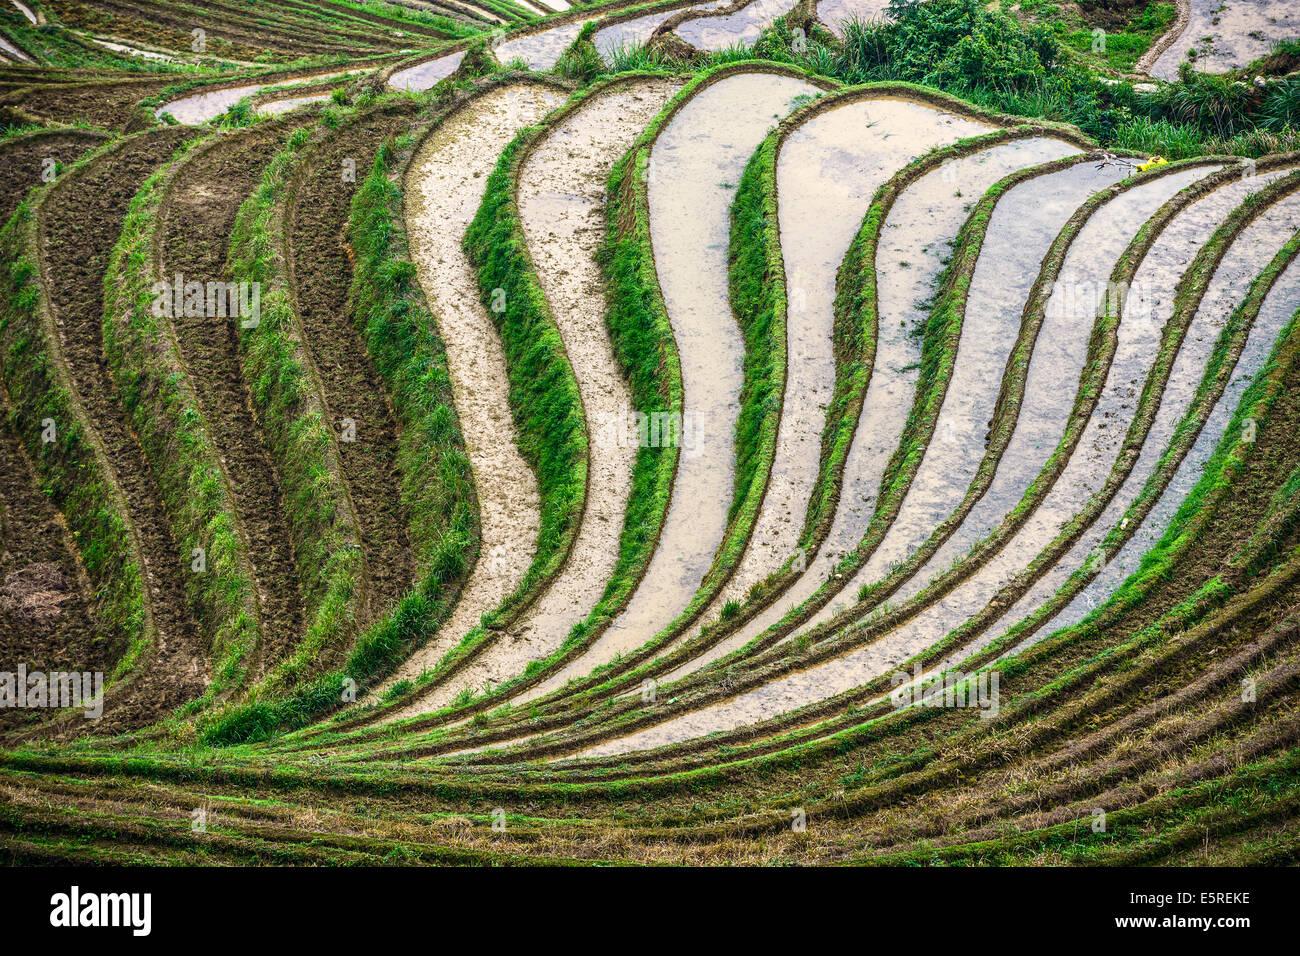 Village on Yaoshan Mountain in Guangxi, China. - Stock Image